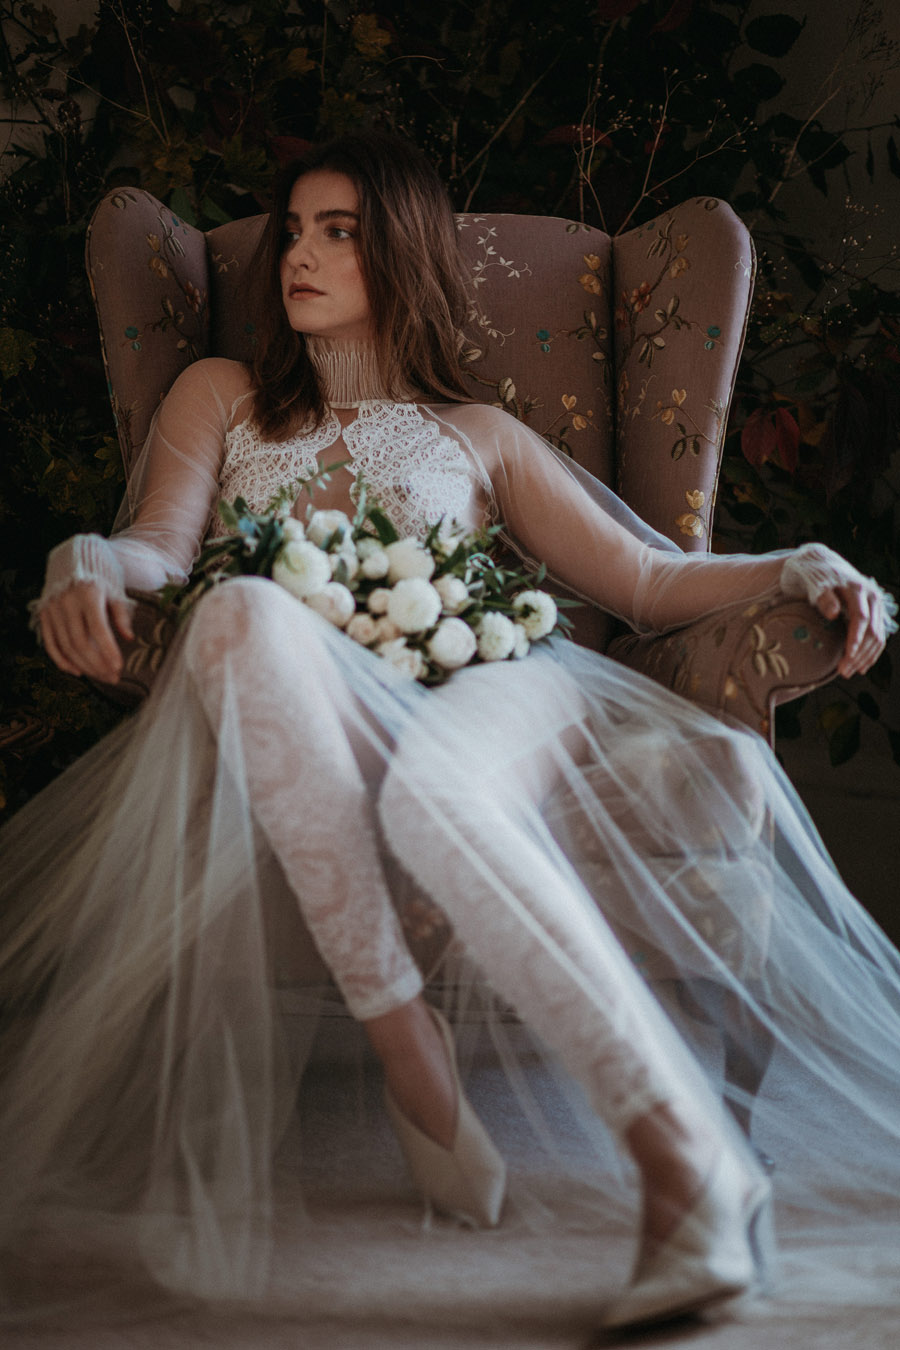 Sanyukta Shrestha autumn daydream bridal collection 2020 (55)